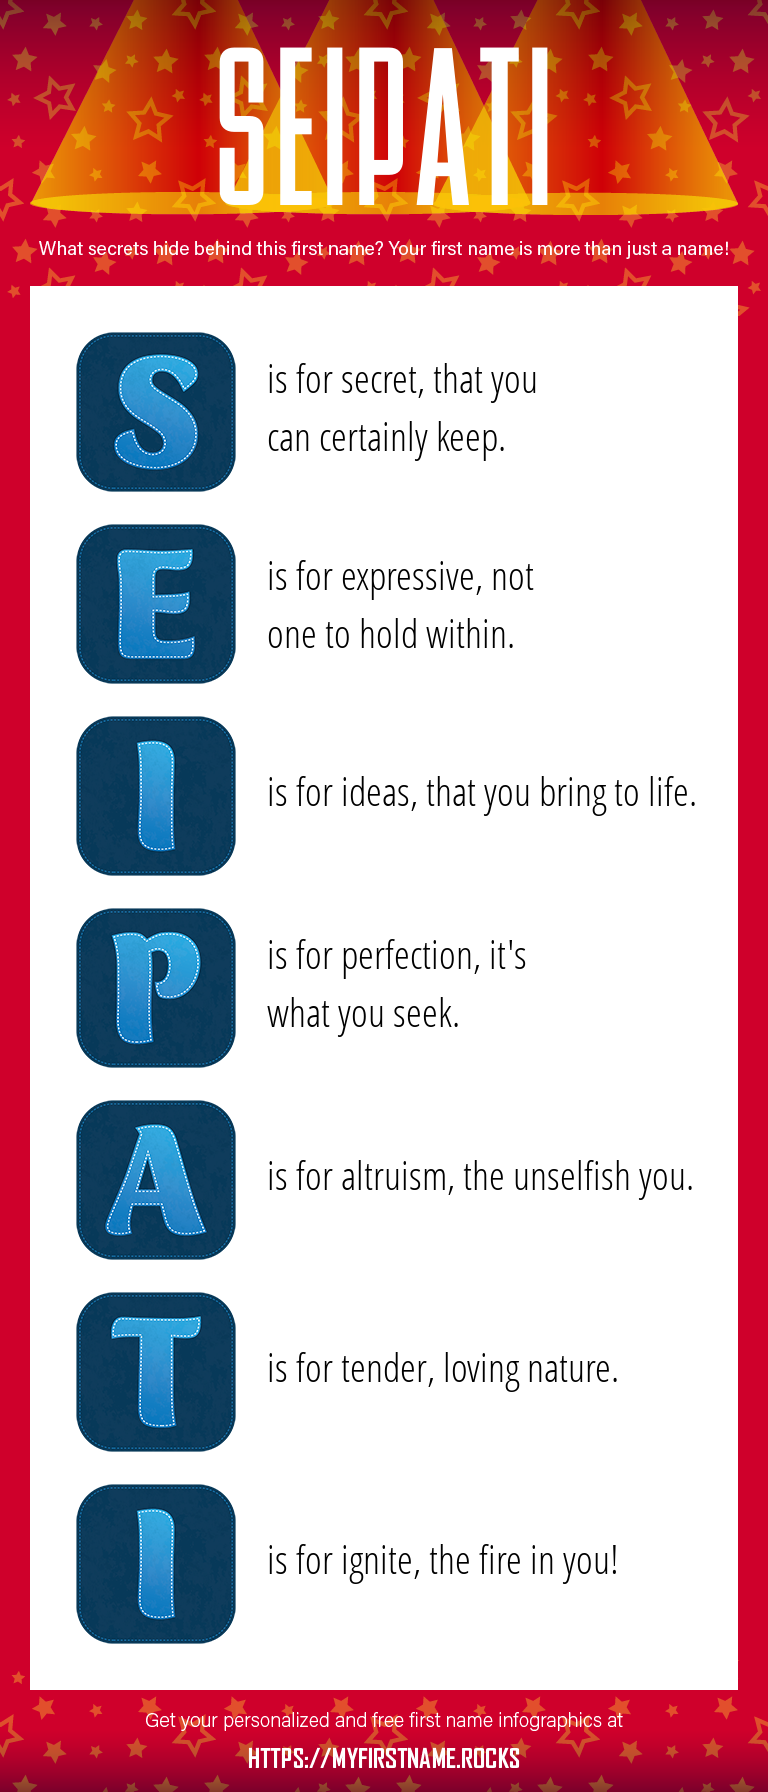 Seipati Infographics